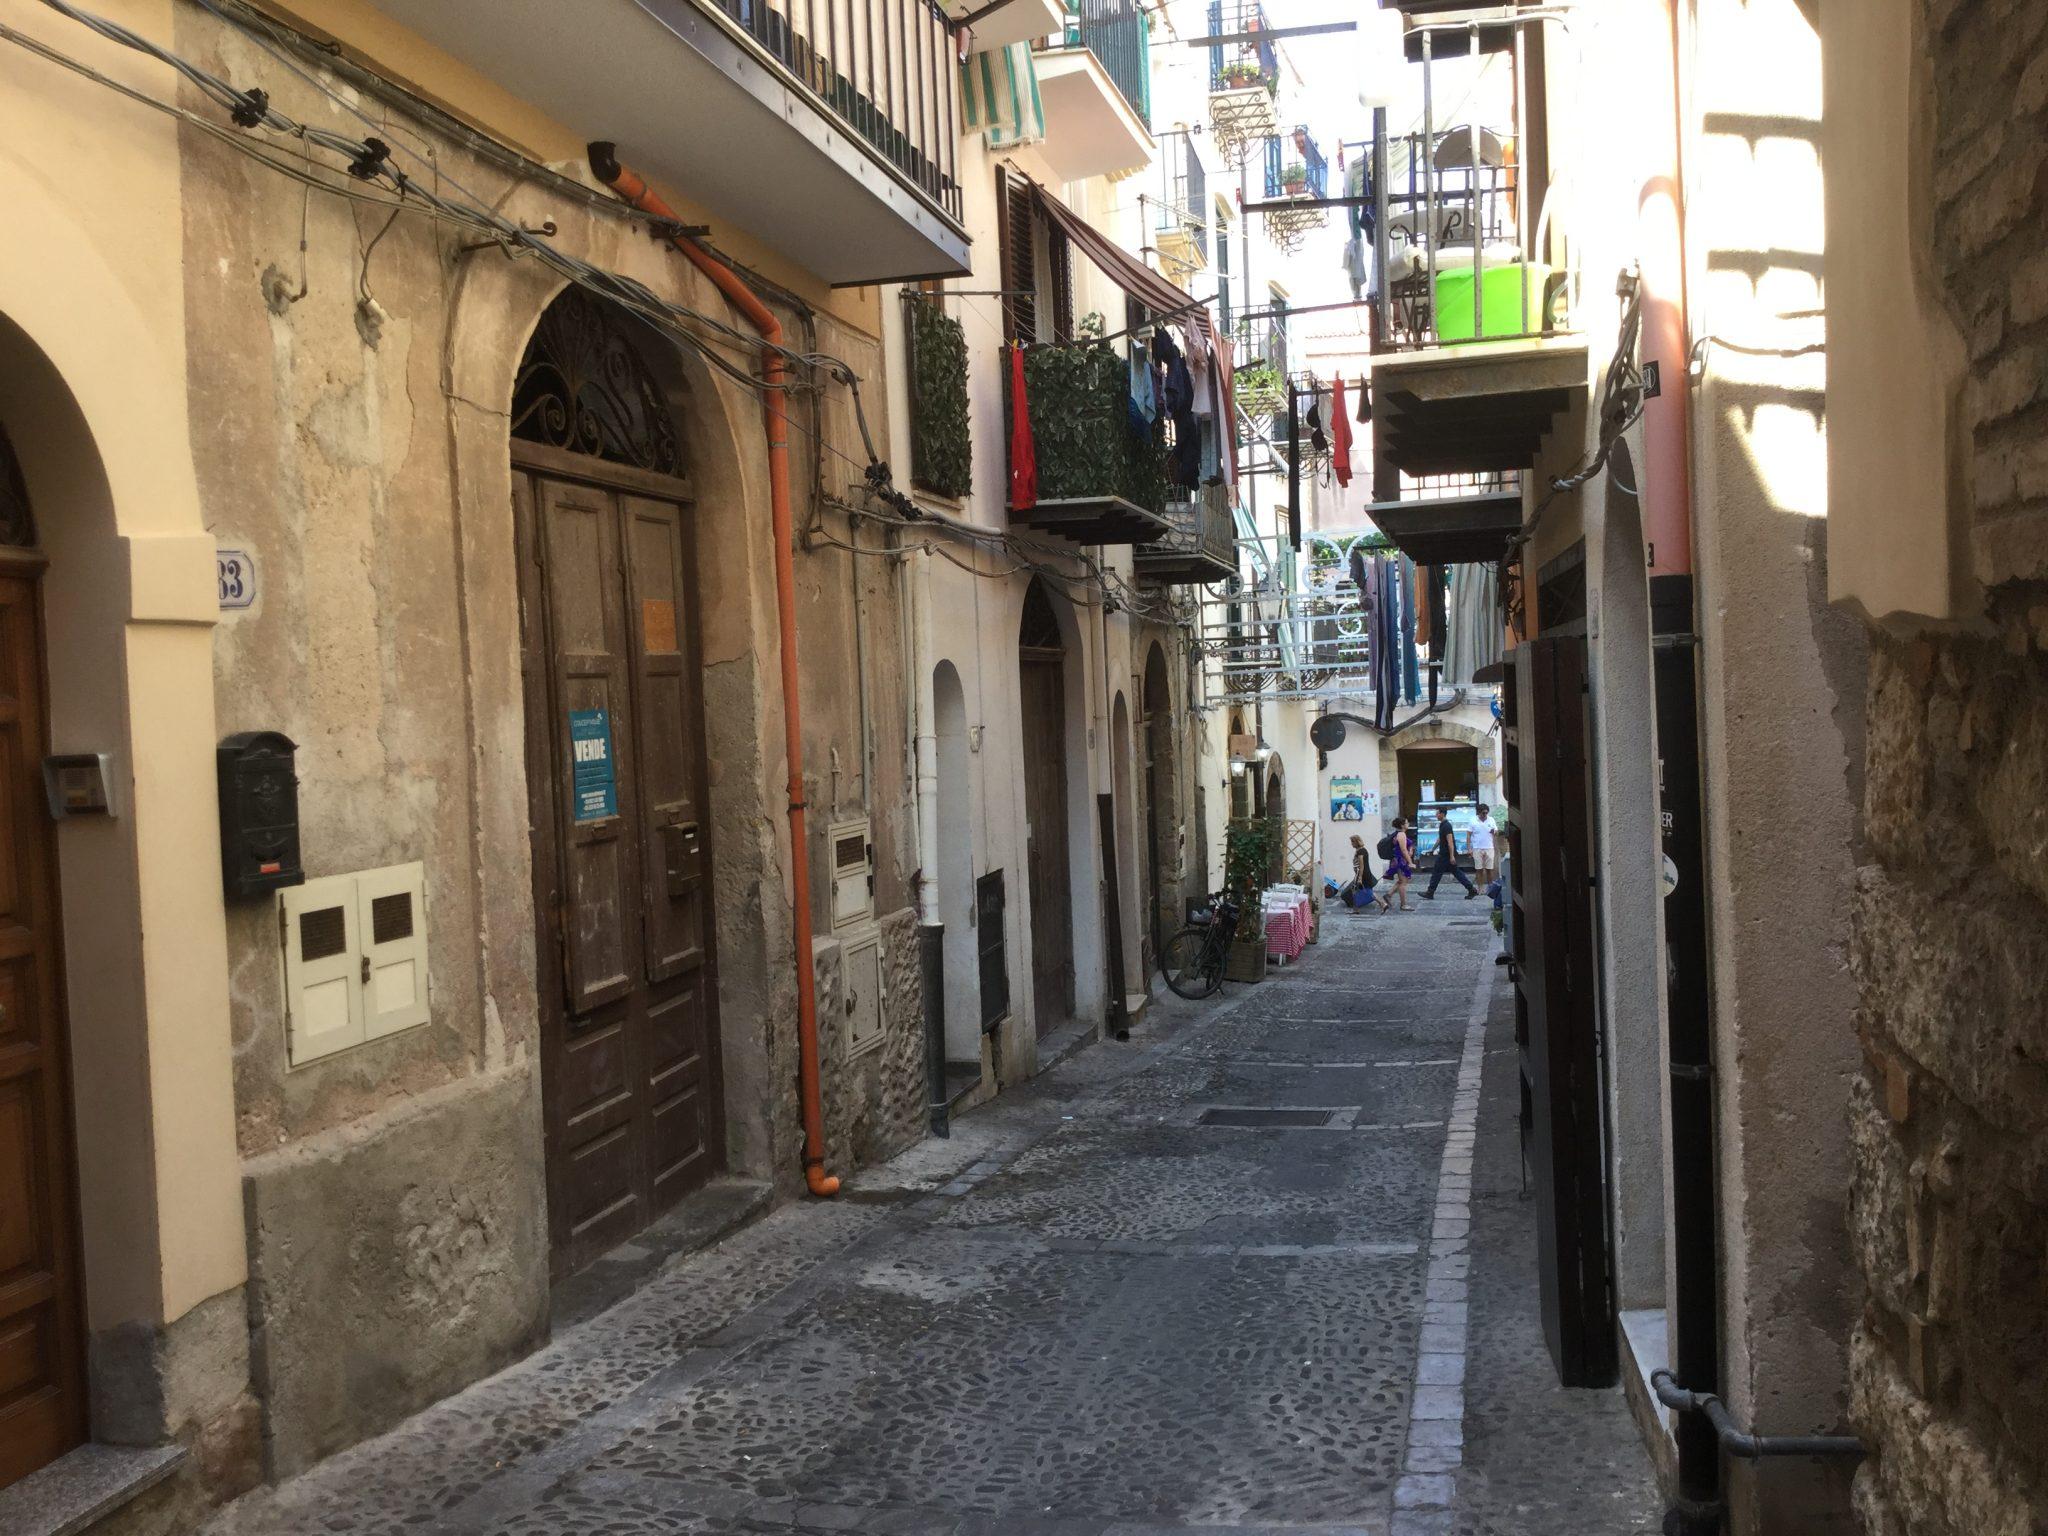 119 - Magazzino in via XXV Novembre , Cefalù.